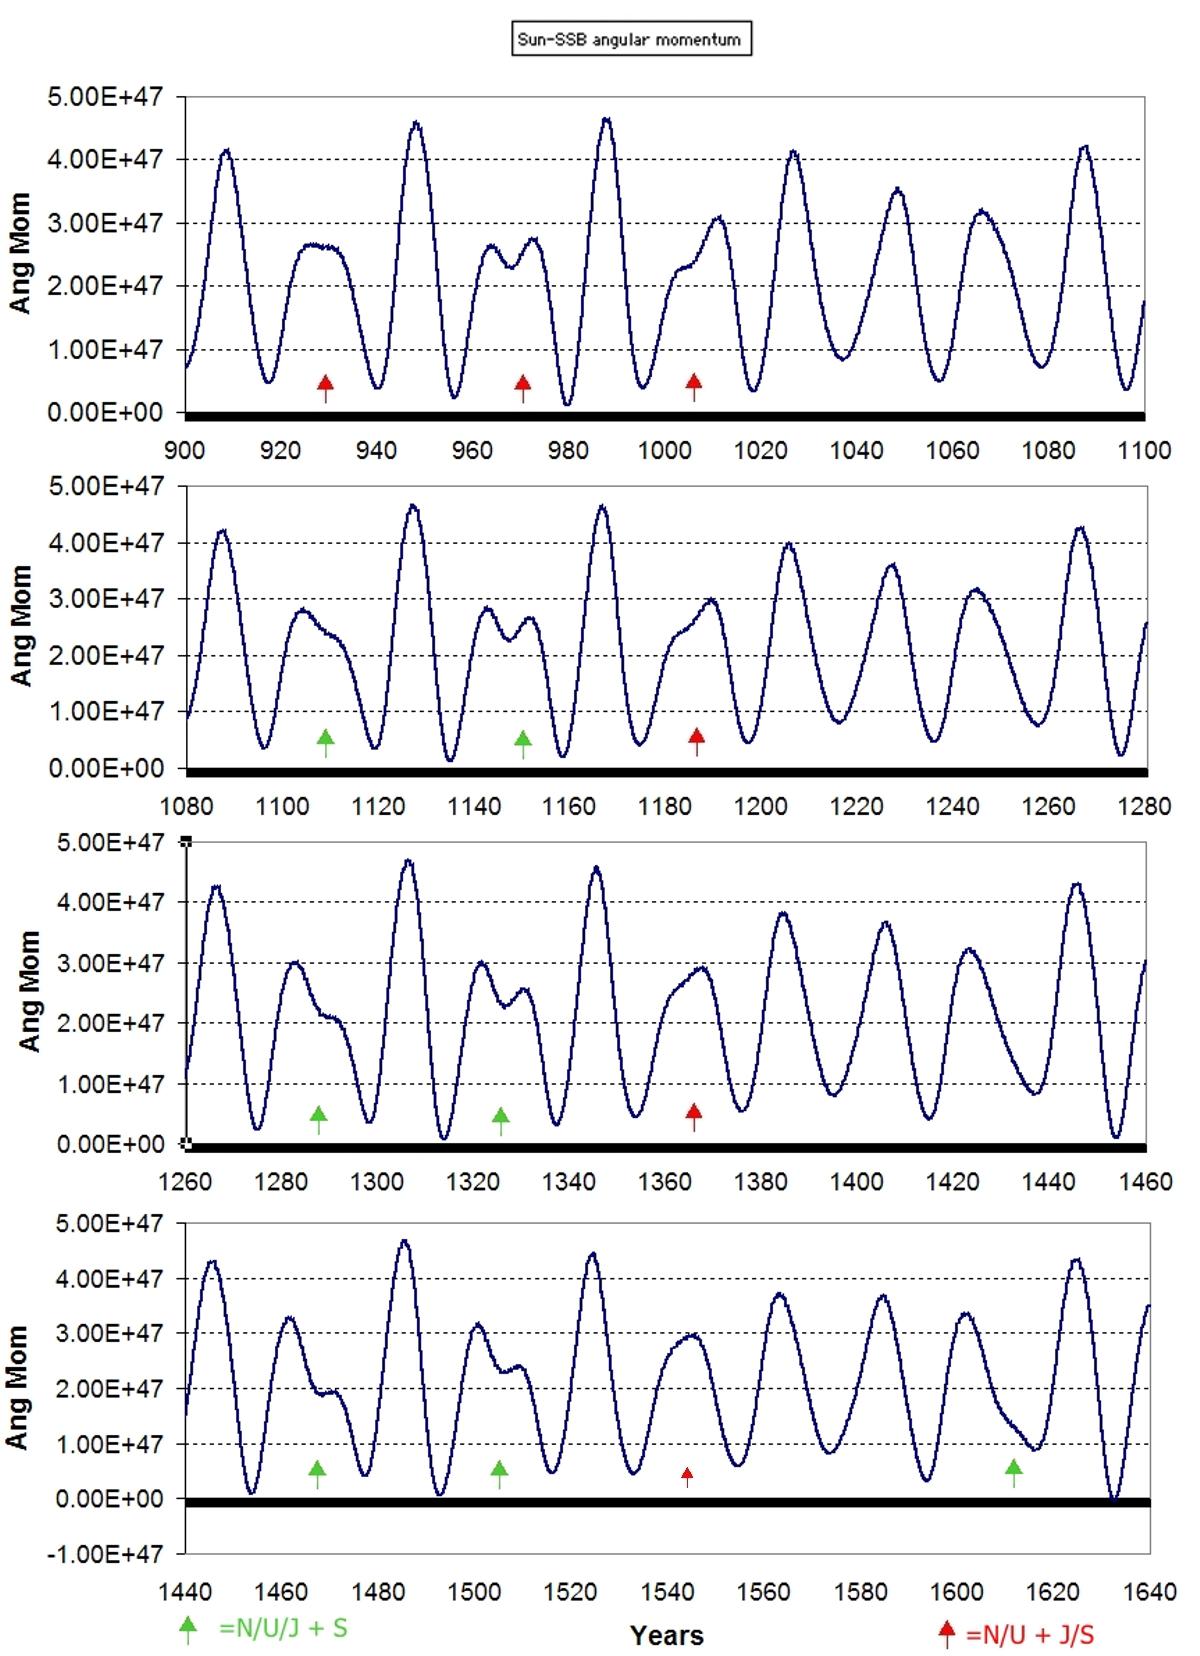 Sun - SSB angular momentum 900 to 1640 graph